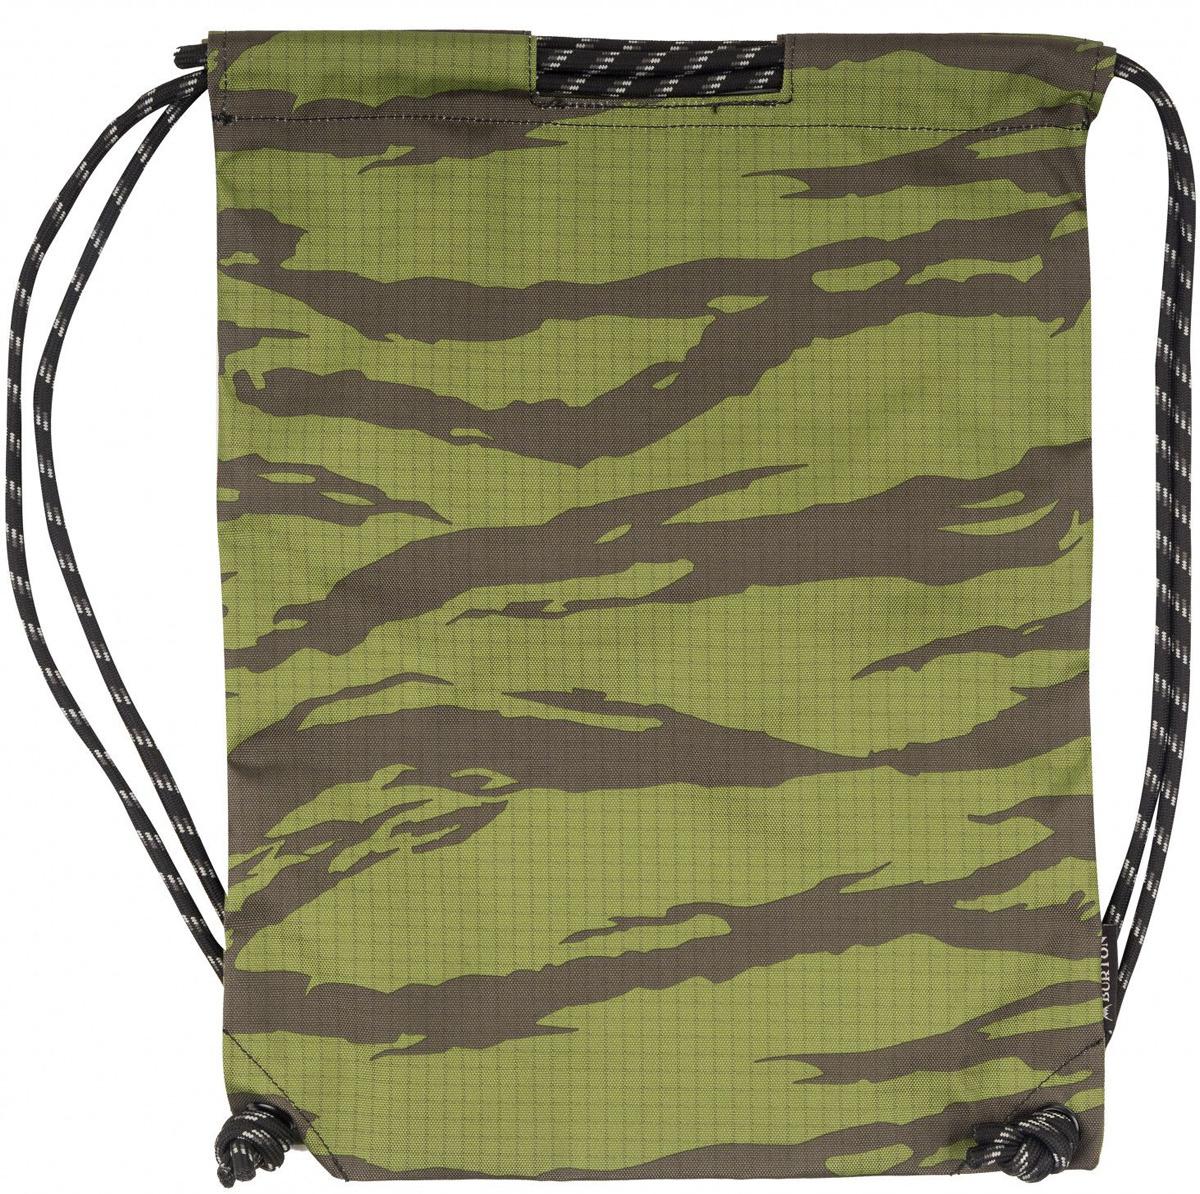 Рюкзак Burton Cinch Bag, 16697106300NA, зеленый, серый, 13 л burton рюкзак cadet pack syrup herringbone win14